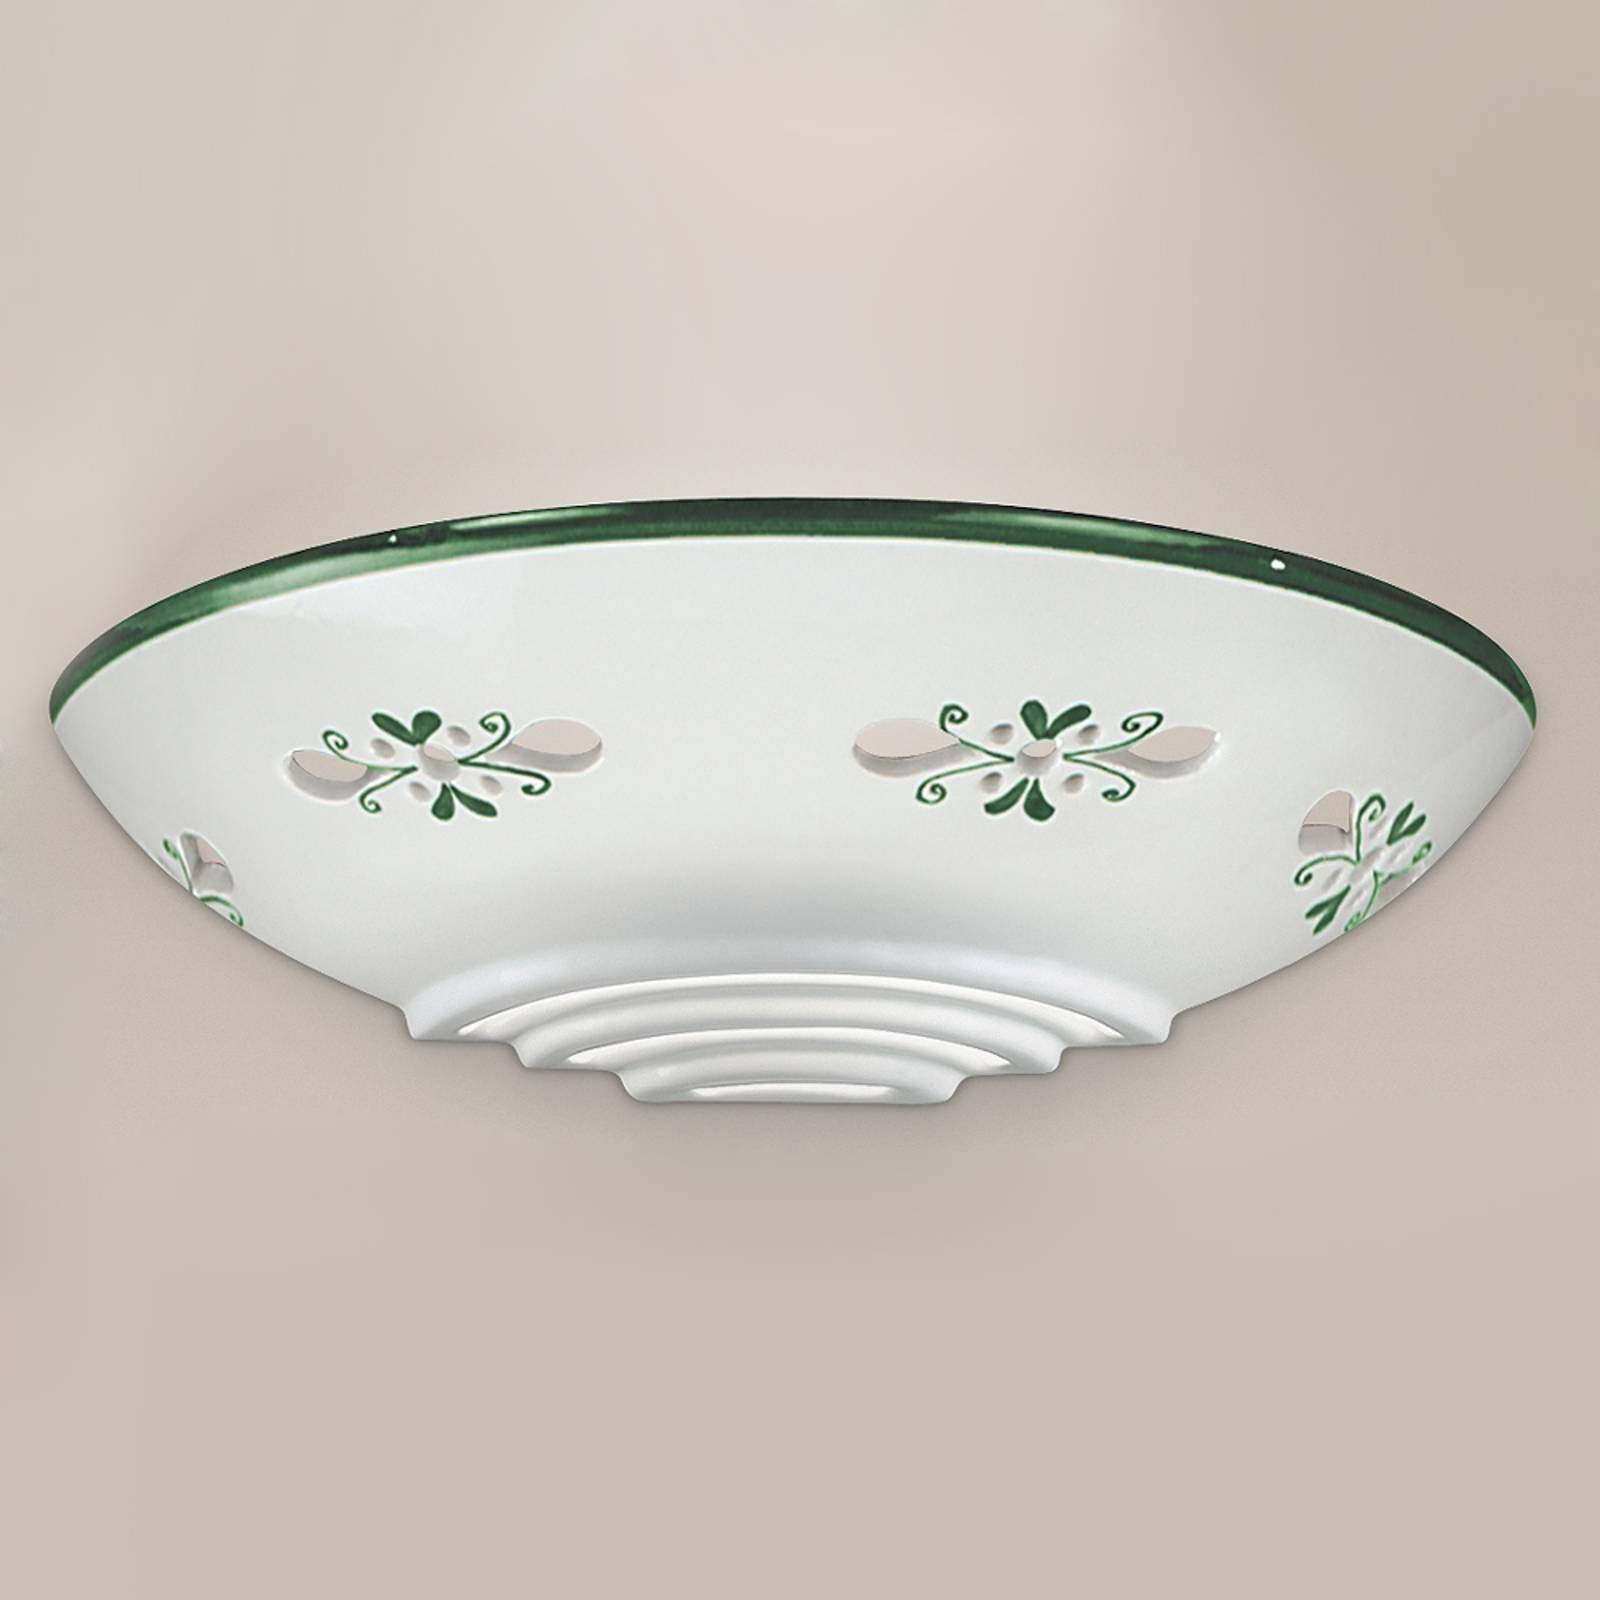 Bassano - mooie keramiek wandlamp, groen